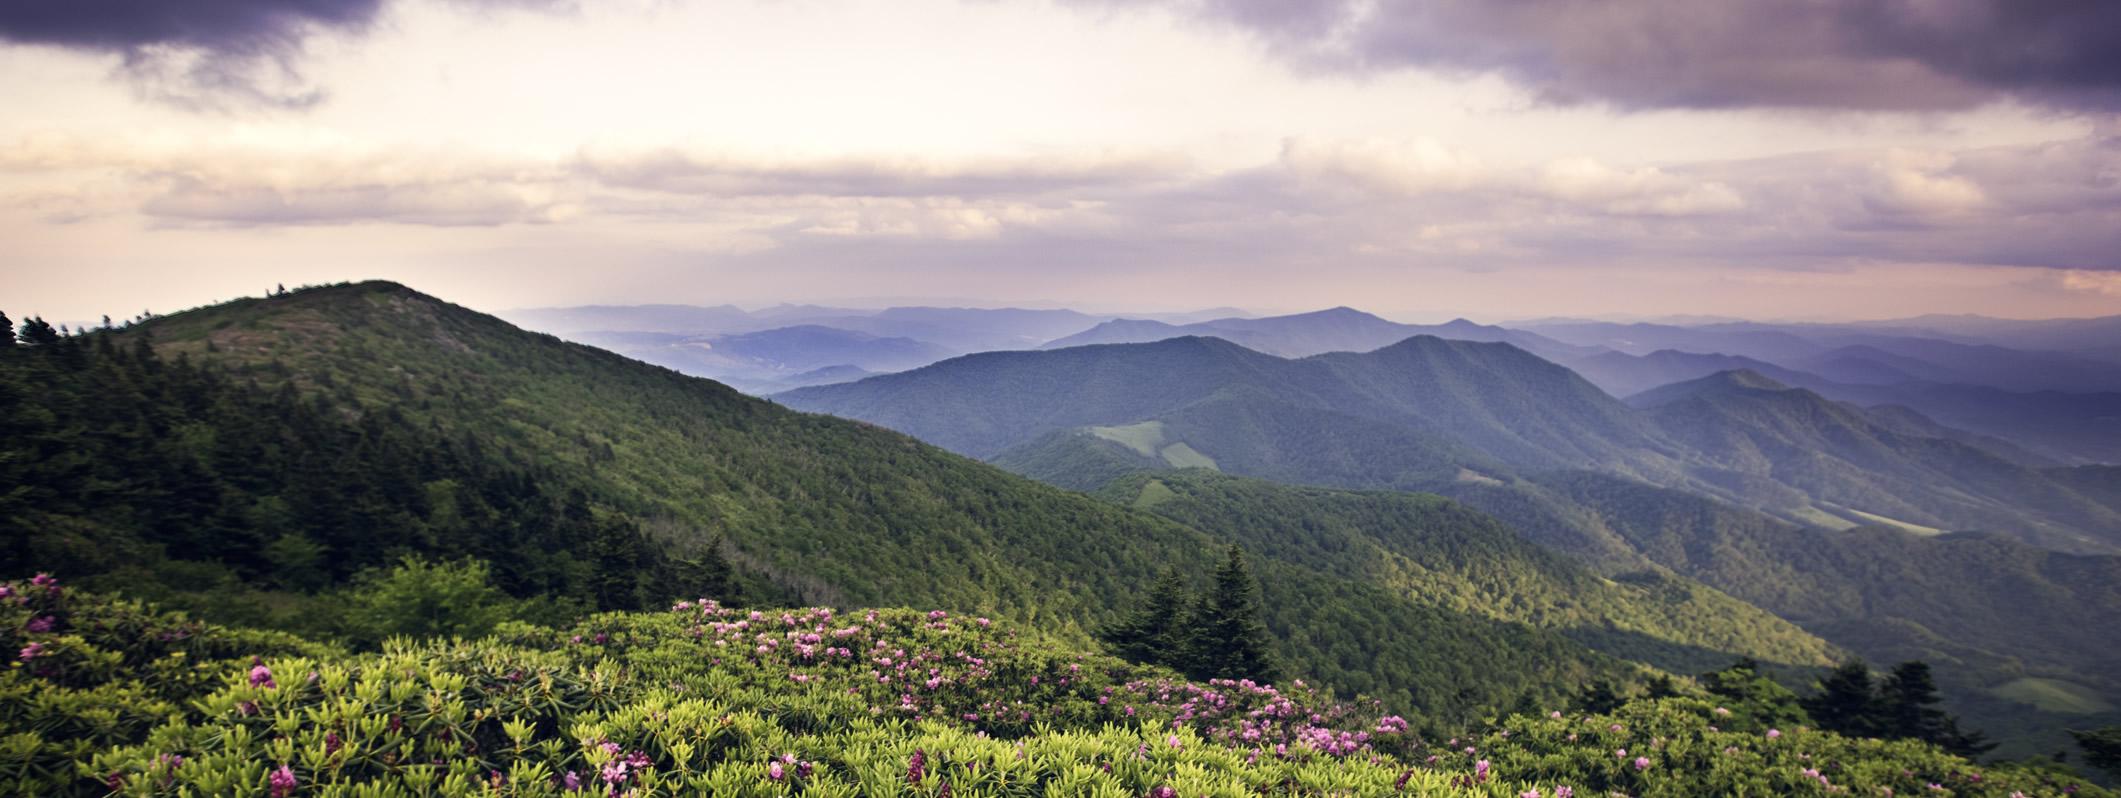 Tennesseebanner image